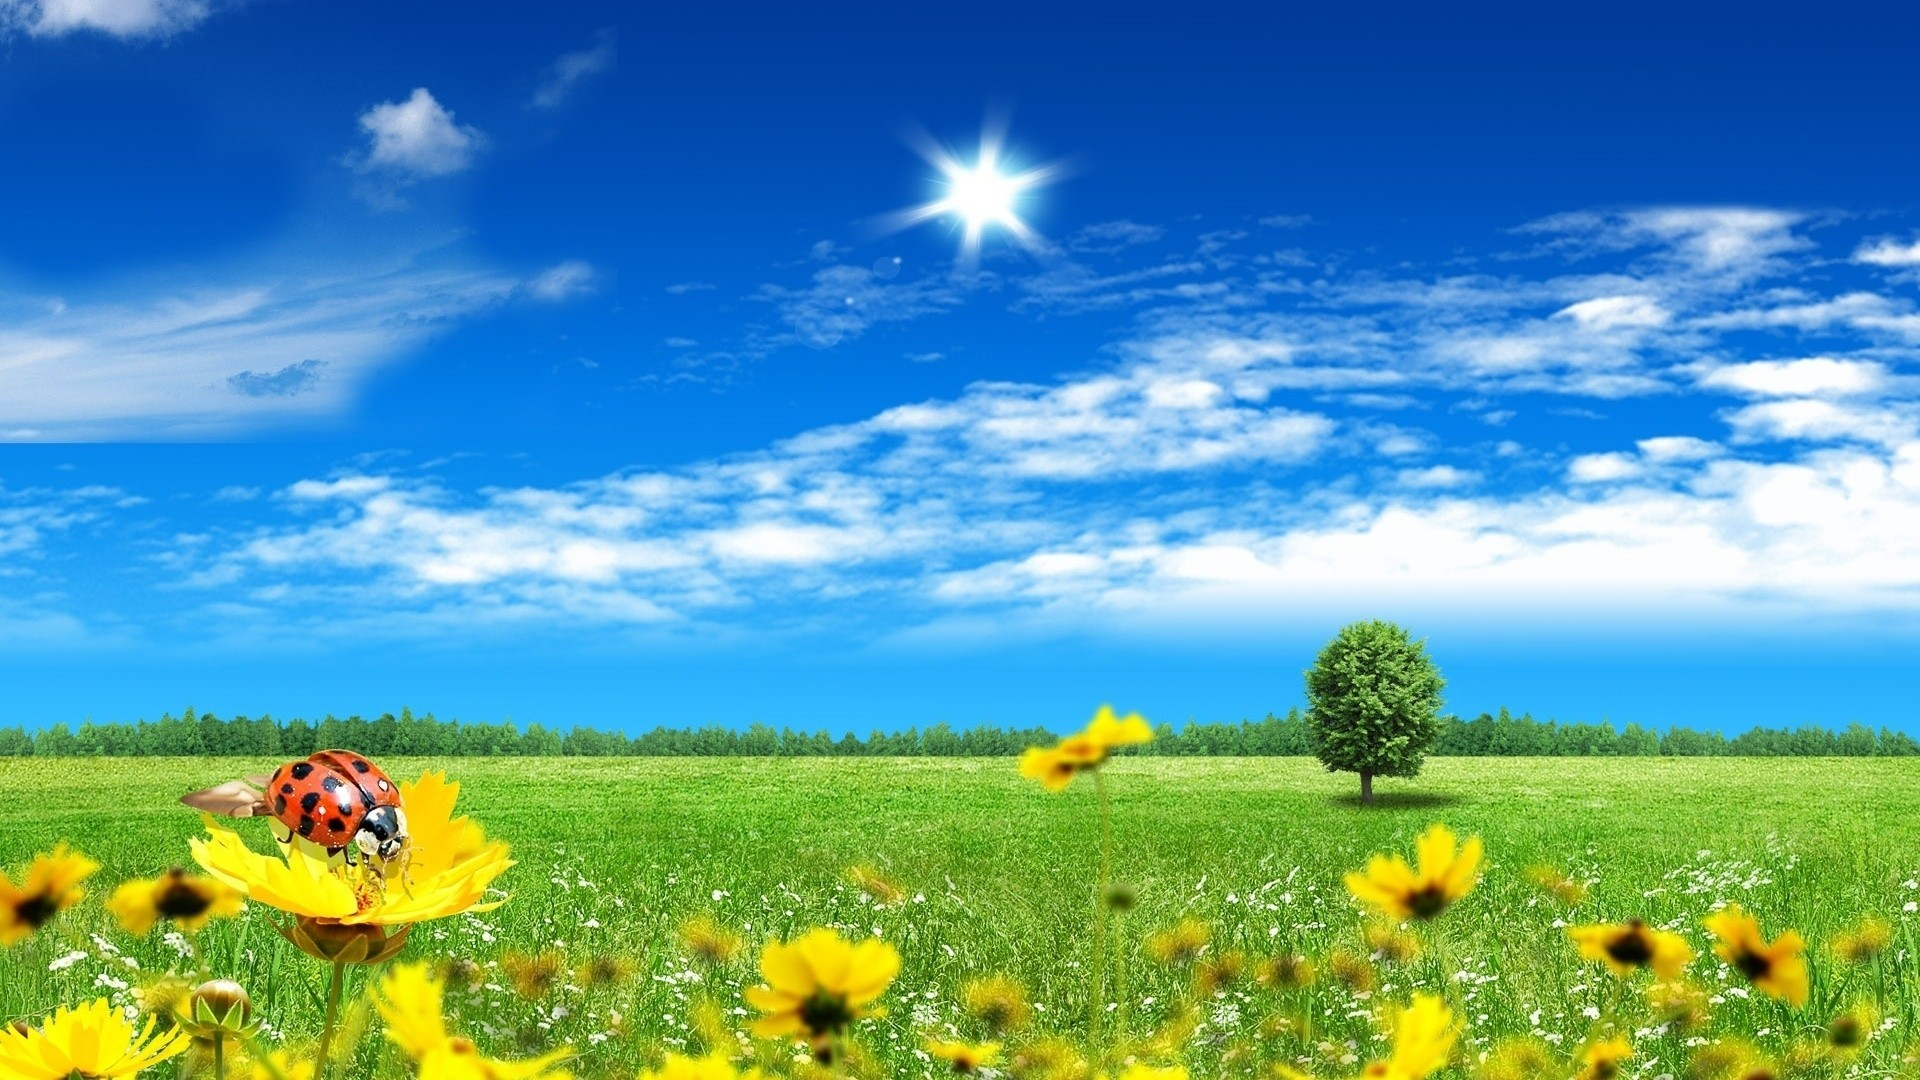 beautiful nature wallpaper ·① download free full hd wallpapers for